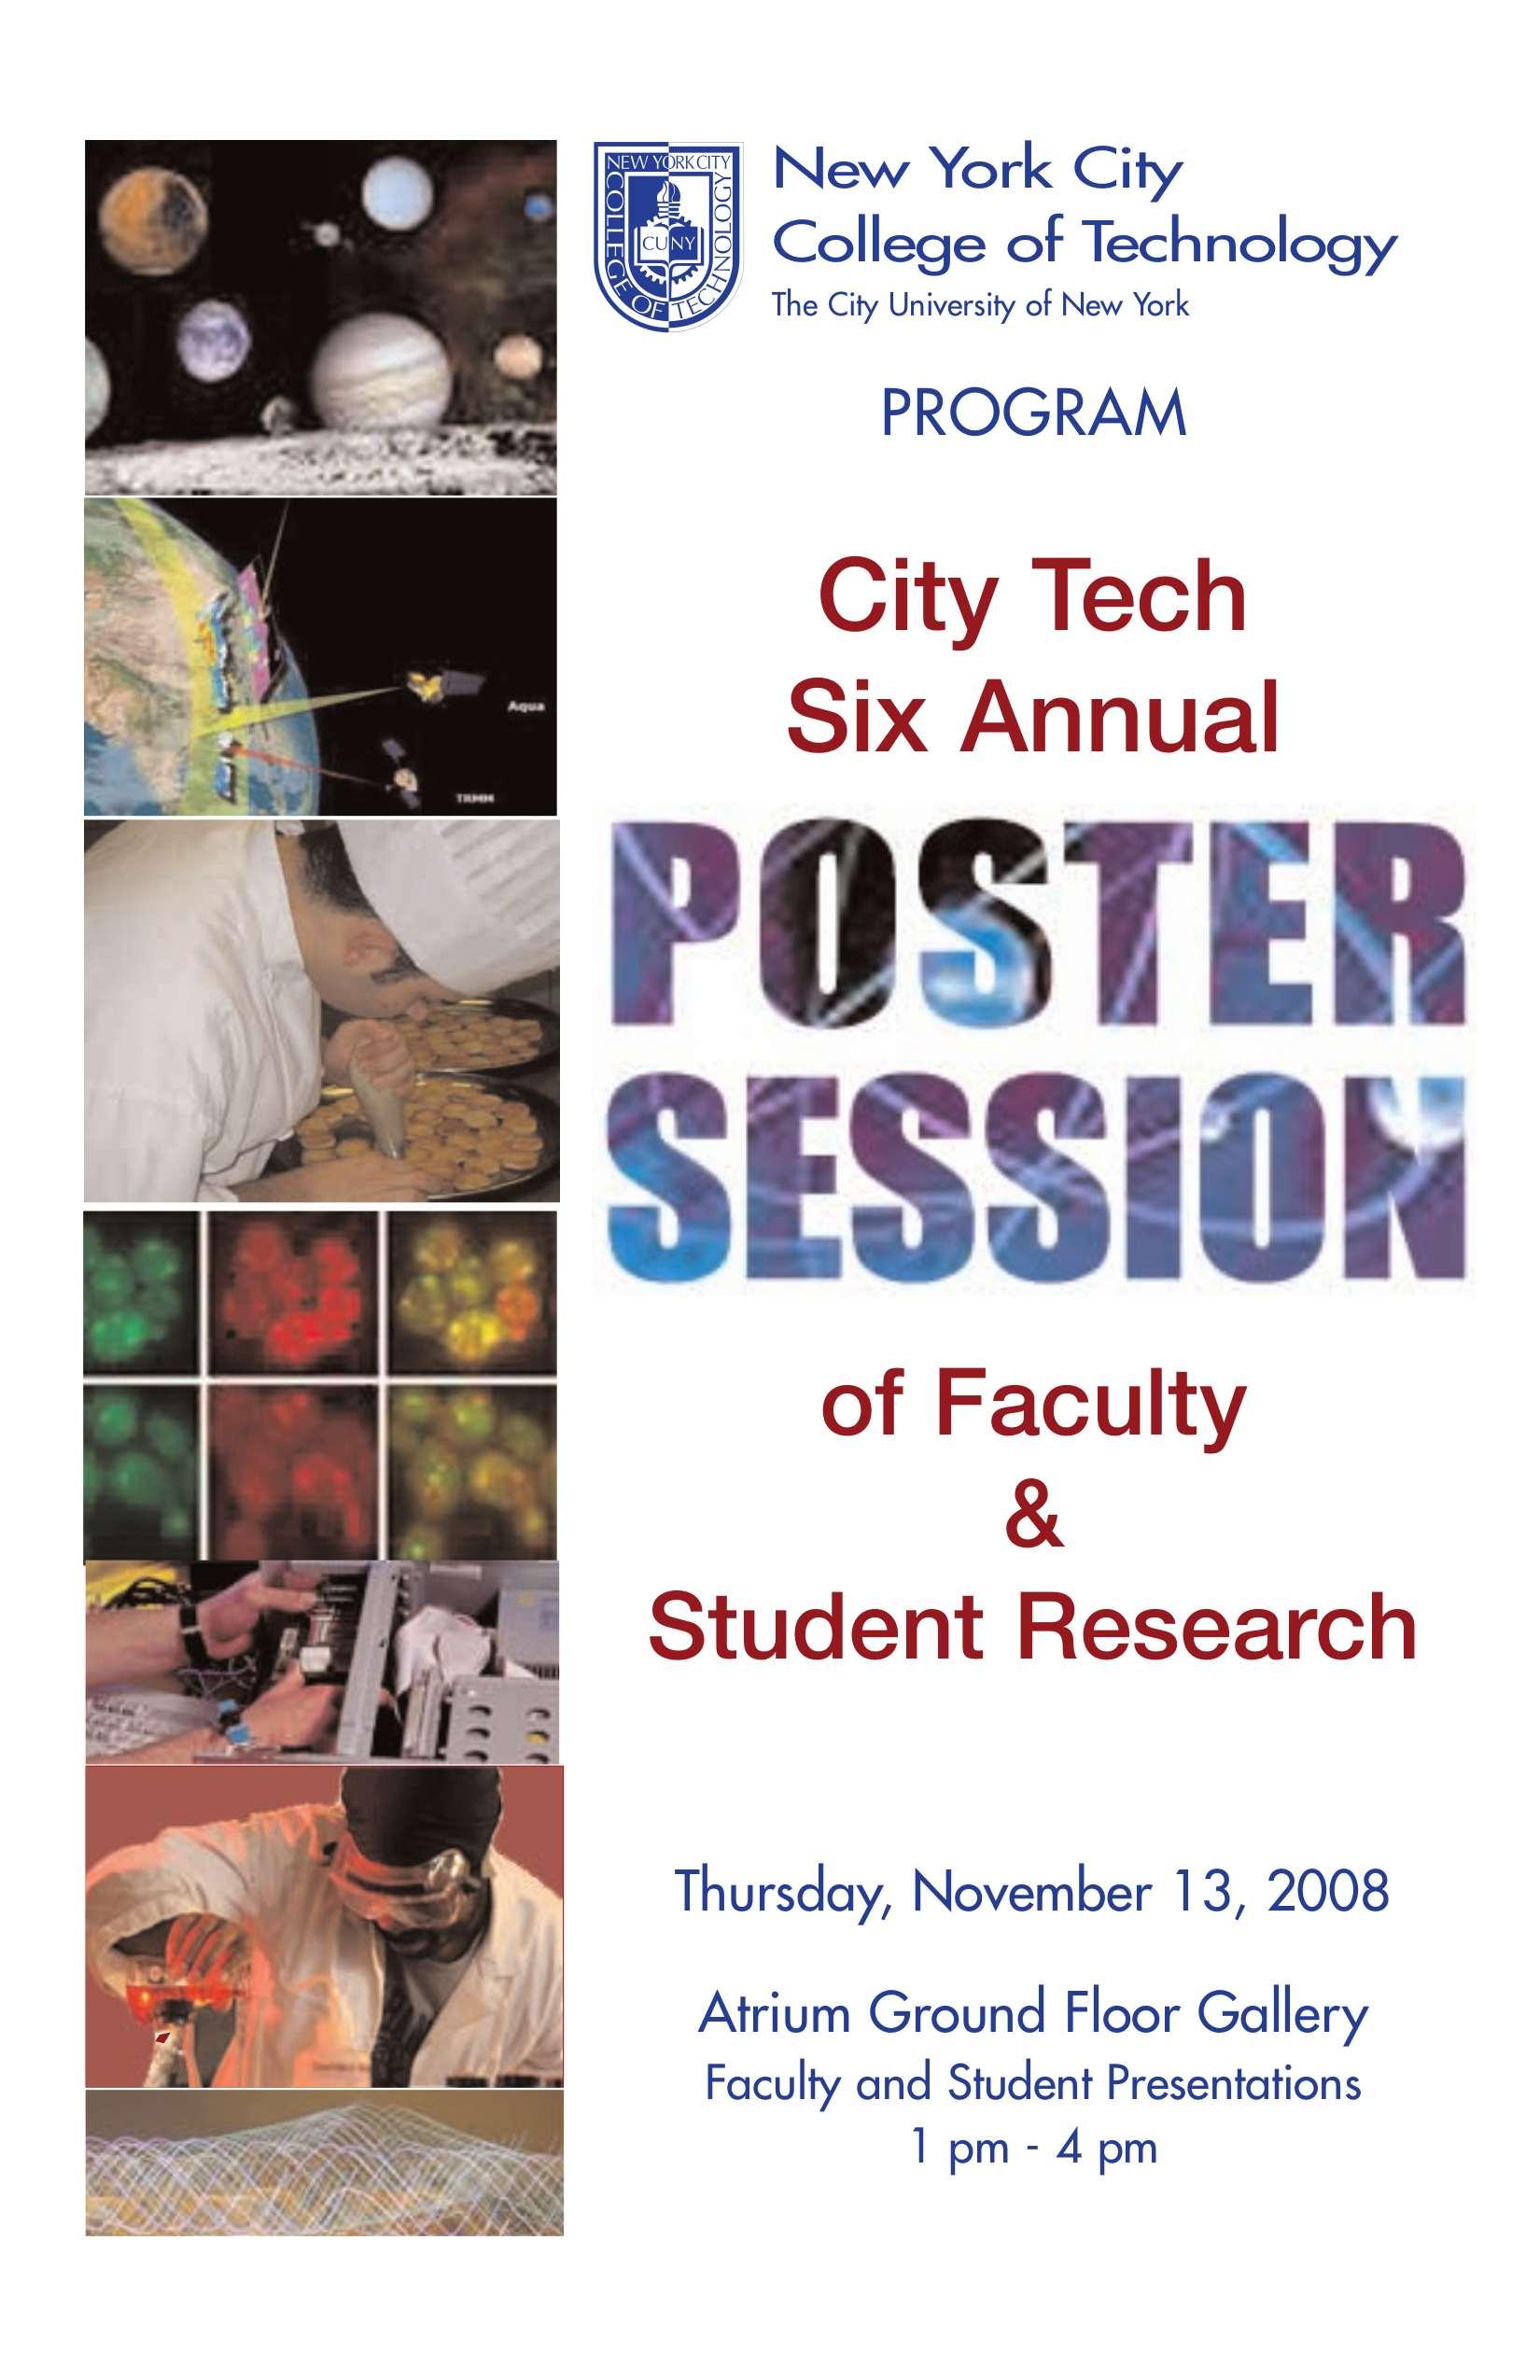 Programs. Historic poster